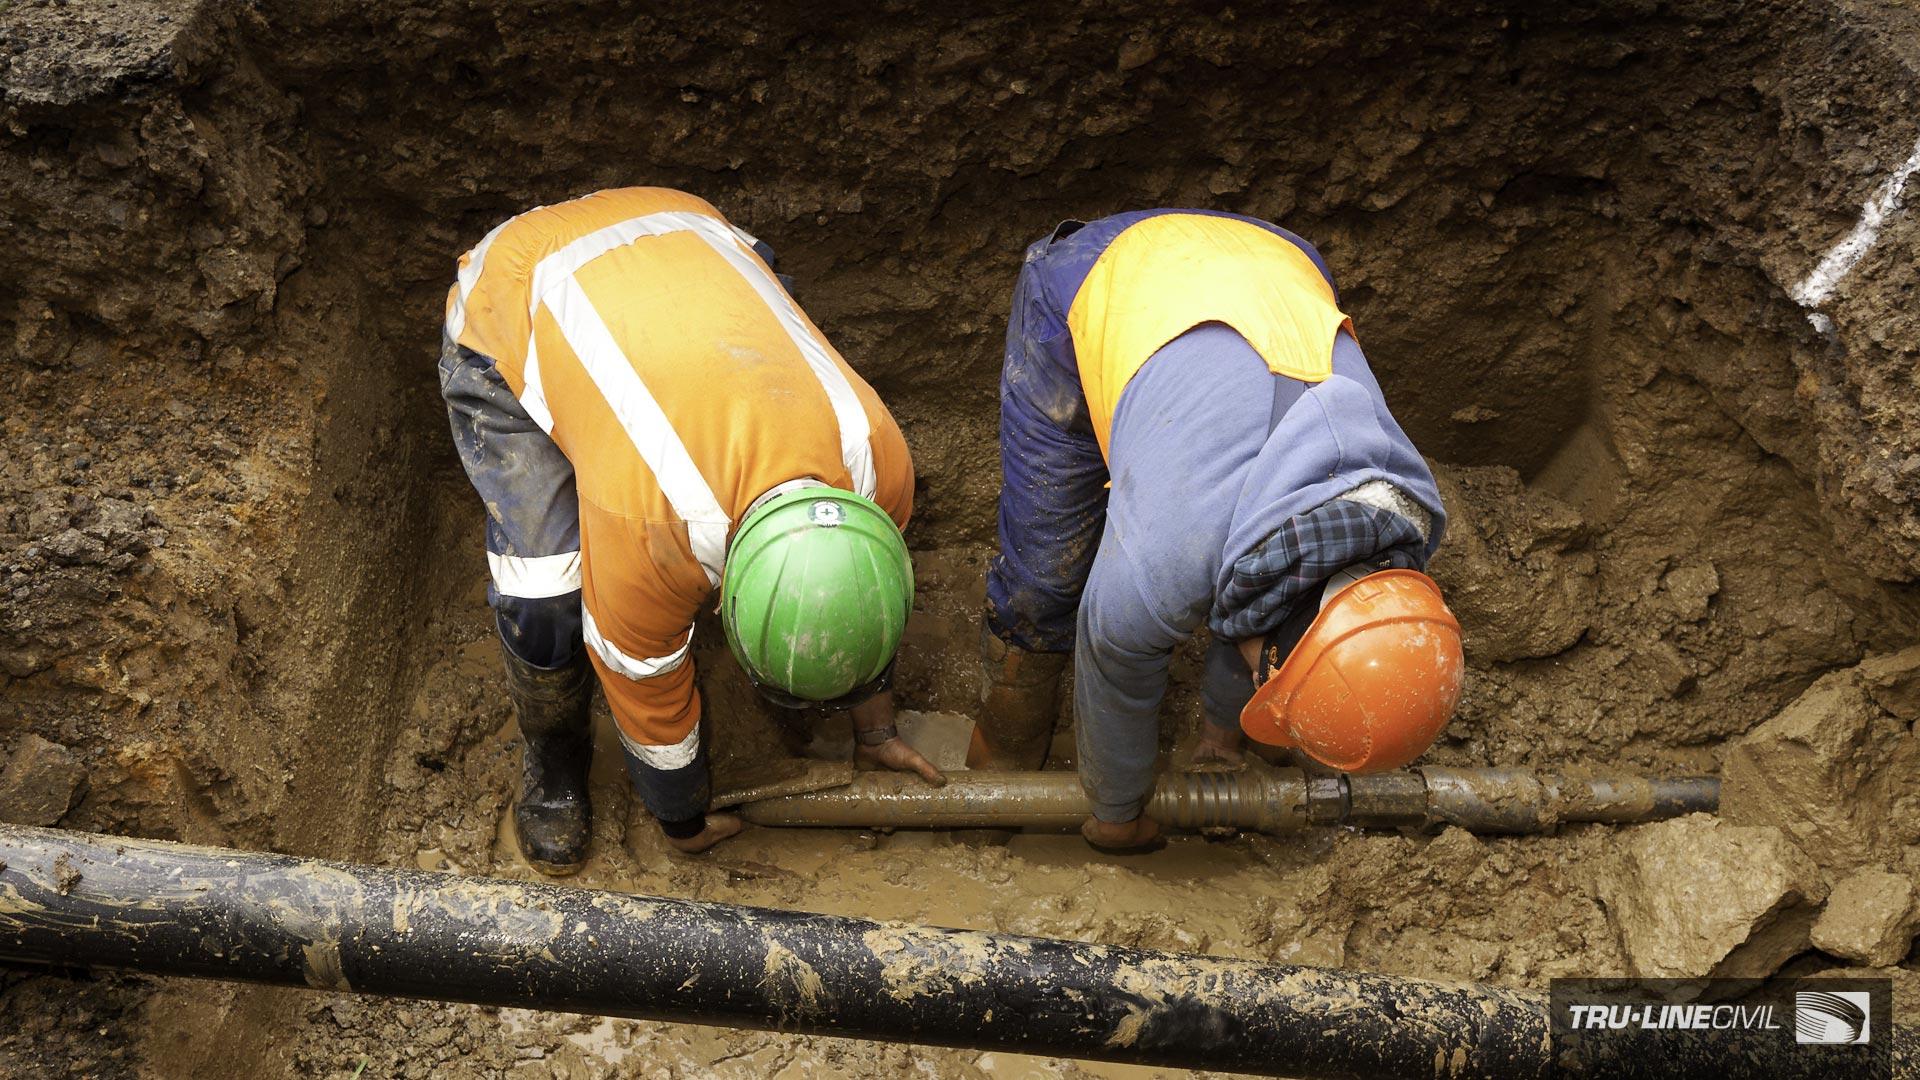 Horizontal Directional Drilling, Tru-Line Civil, Akaroa, documentary, photography, Akaroa Water Supply Stage 3, Reticulation Upgrade